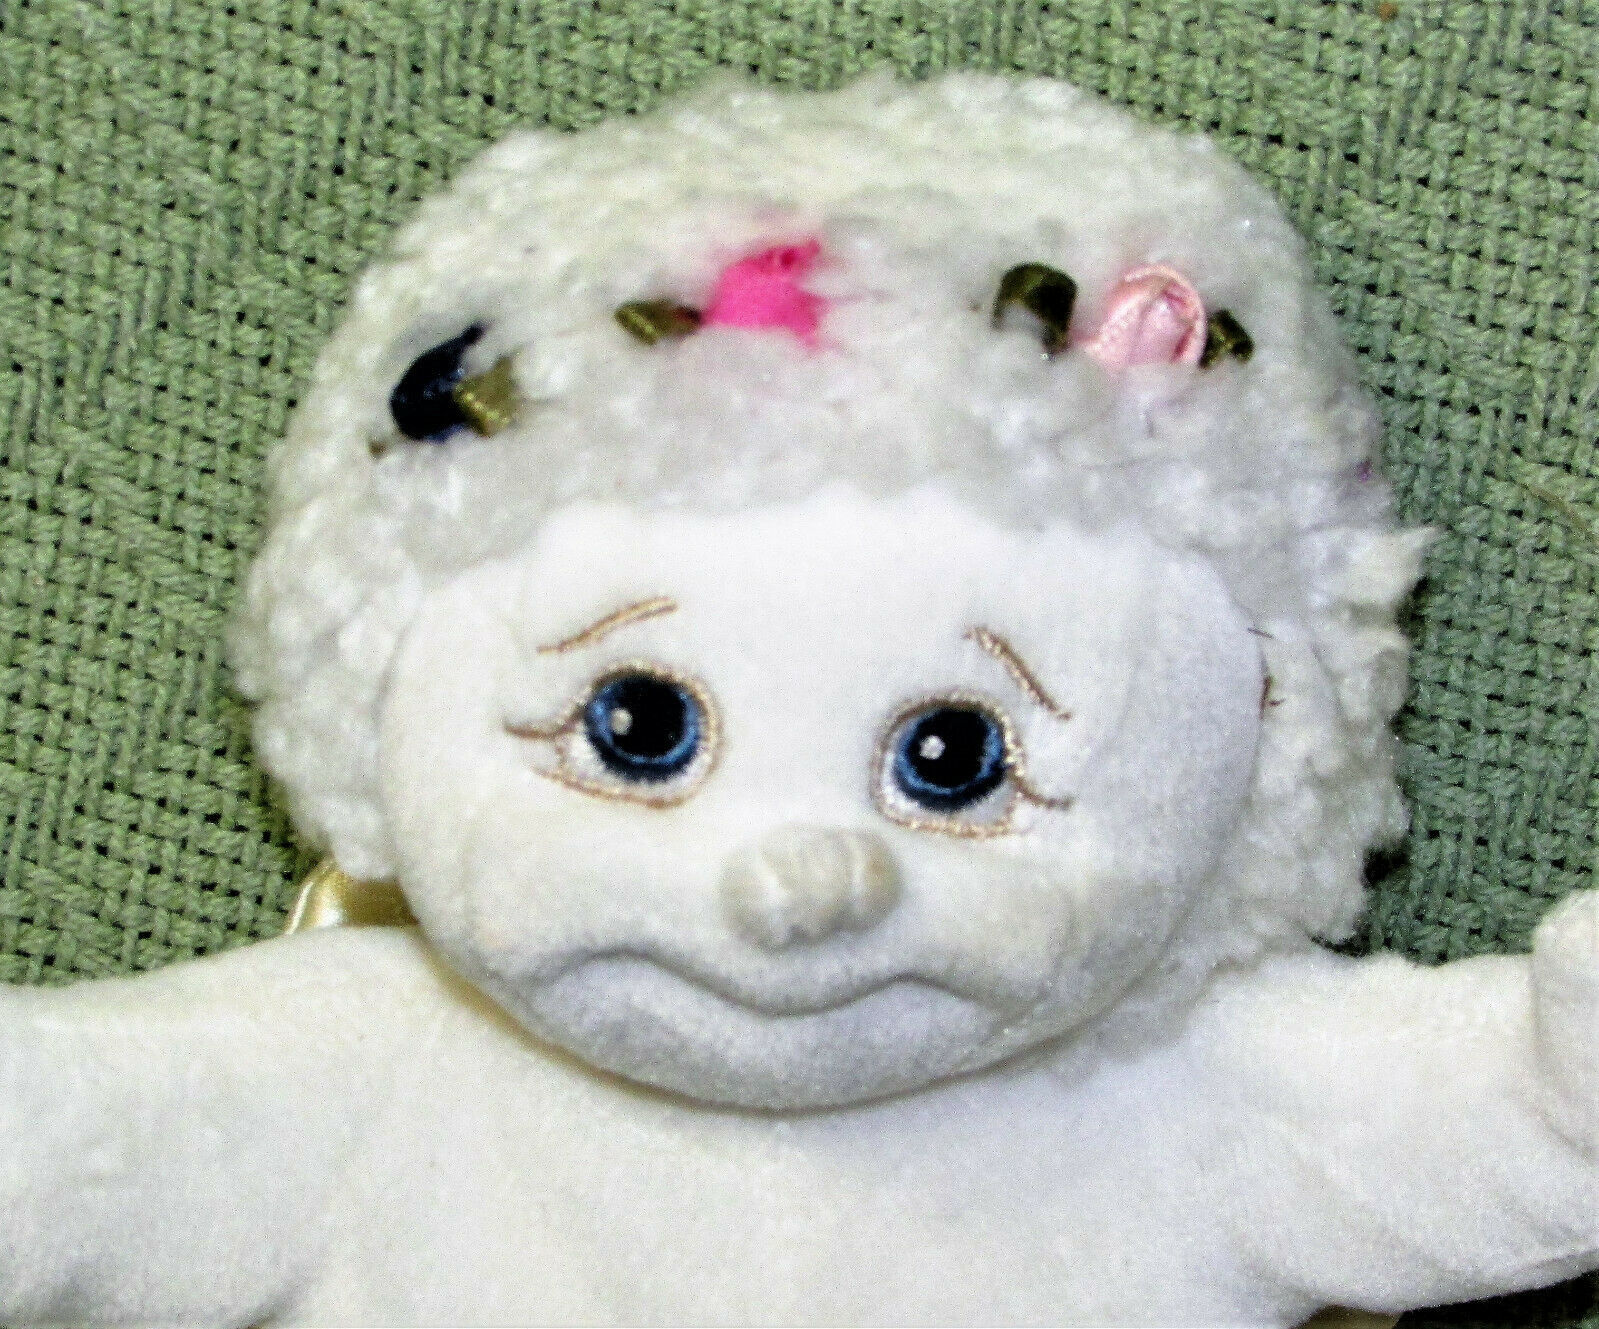 1999 DREAMSICLES ANGEL HUGS BEANBAG VINTAGE STUFFED ANIMAL PLUSH DOLL SATIN WING image 2